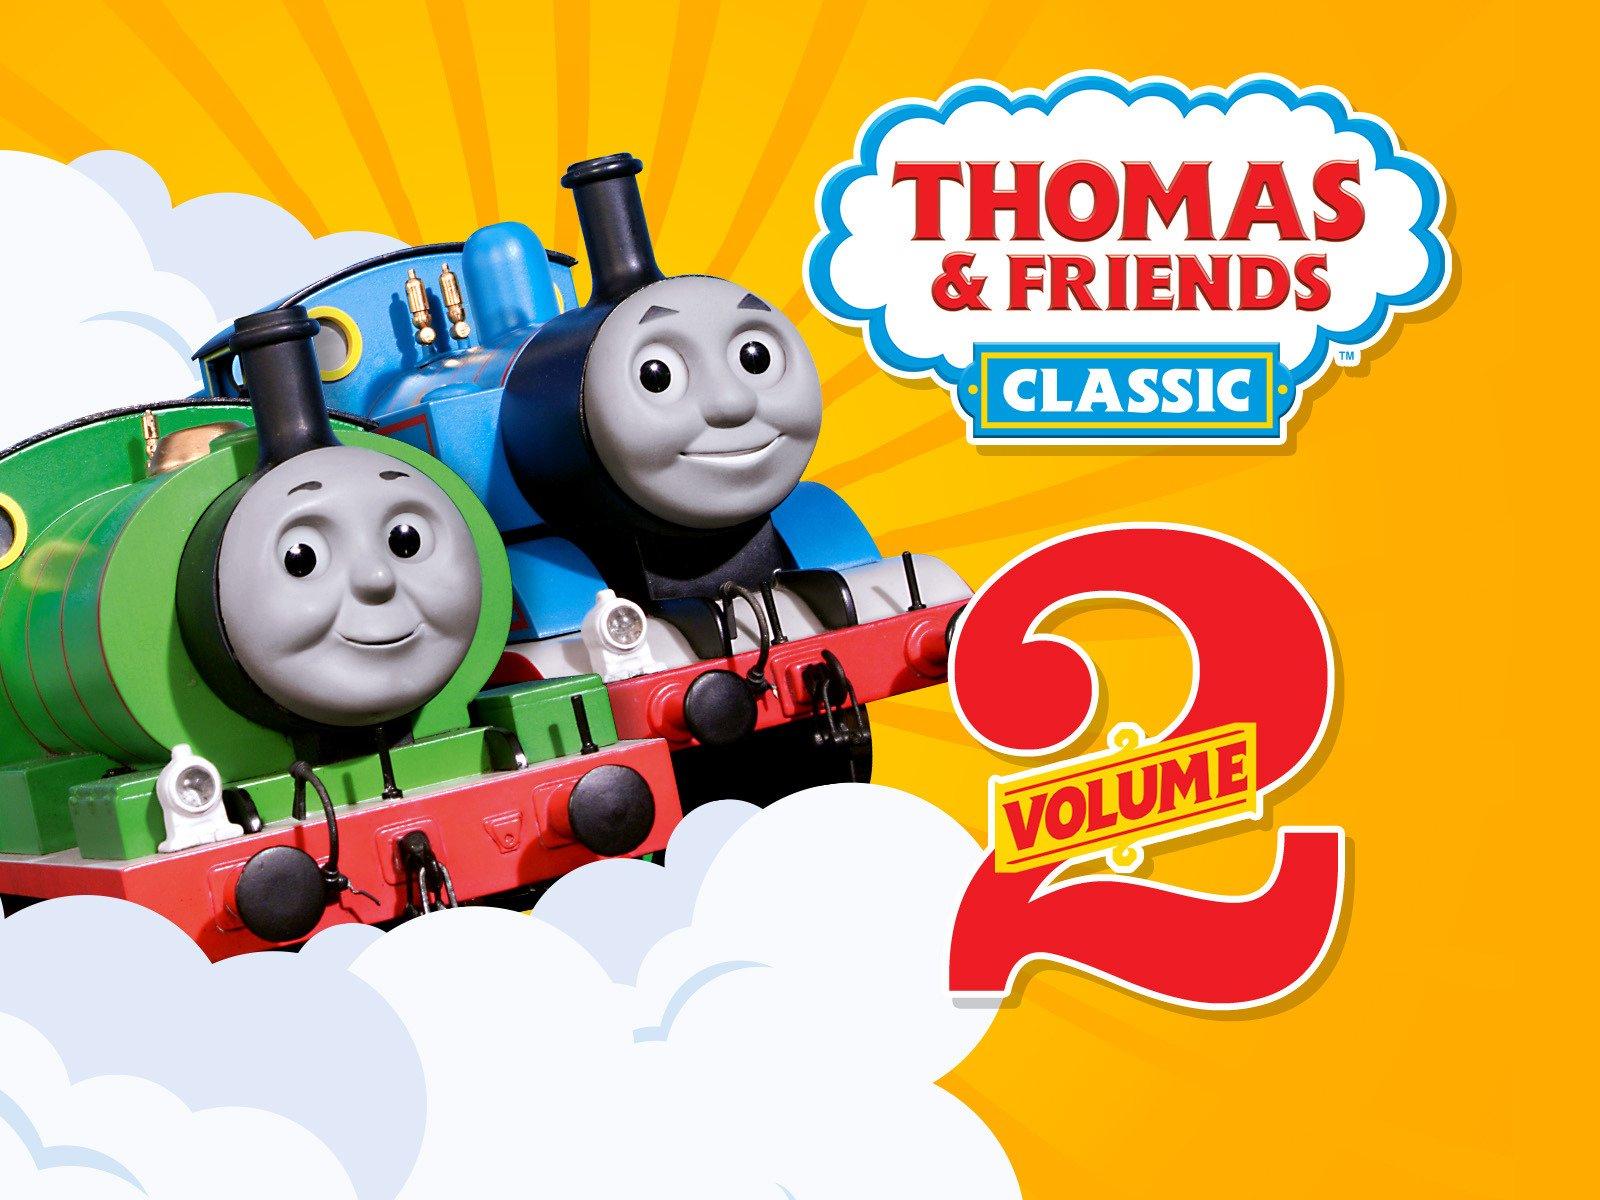 Thomas & Friends Classic Volume 2